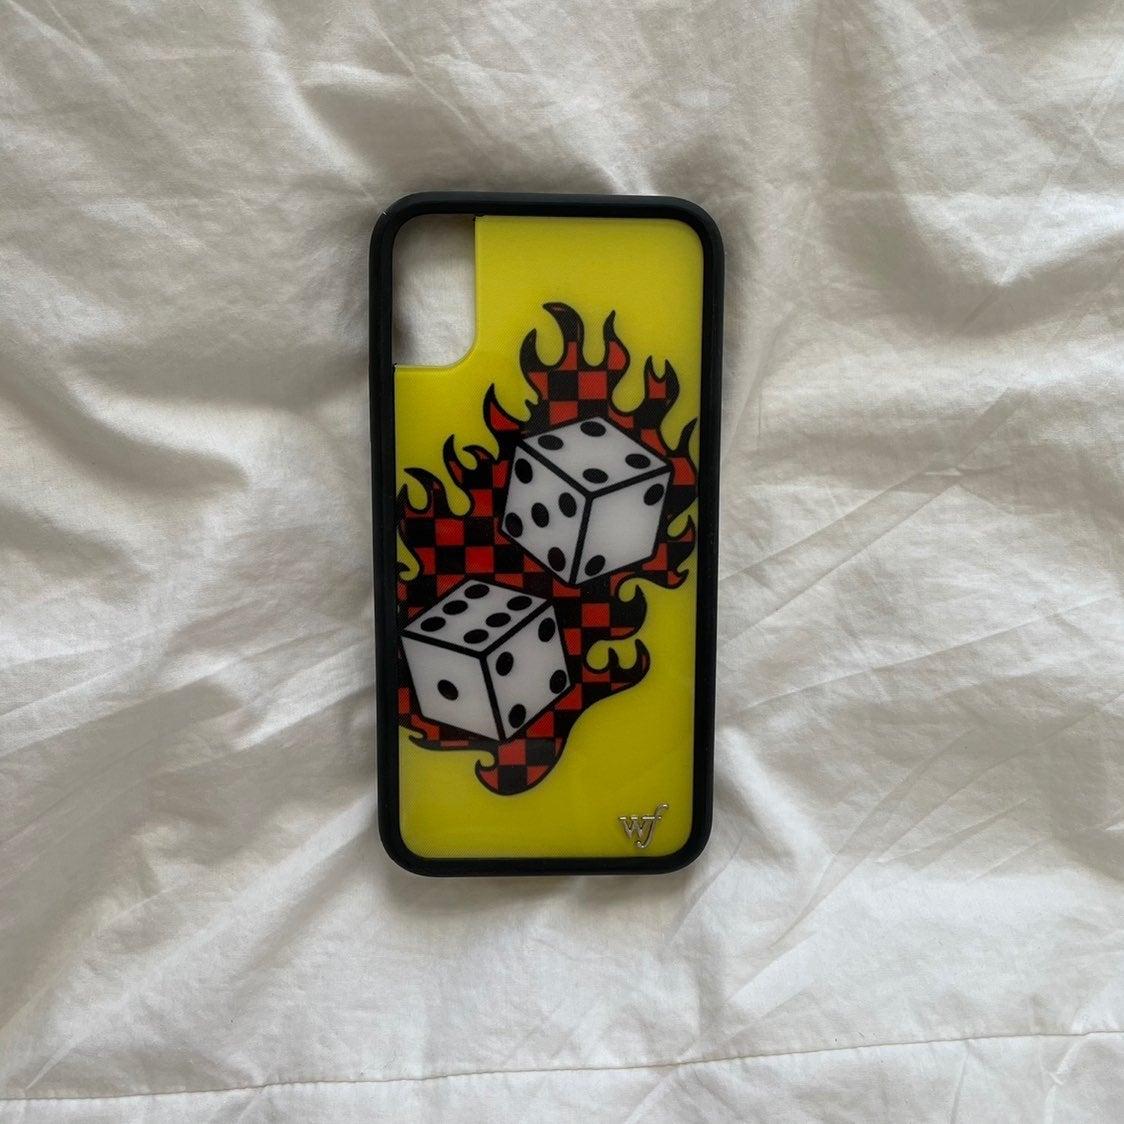 Wildflower Tana Mongeau iPhone X/XS Case